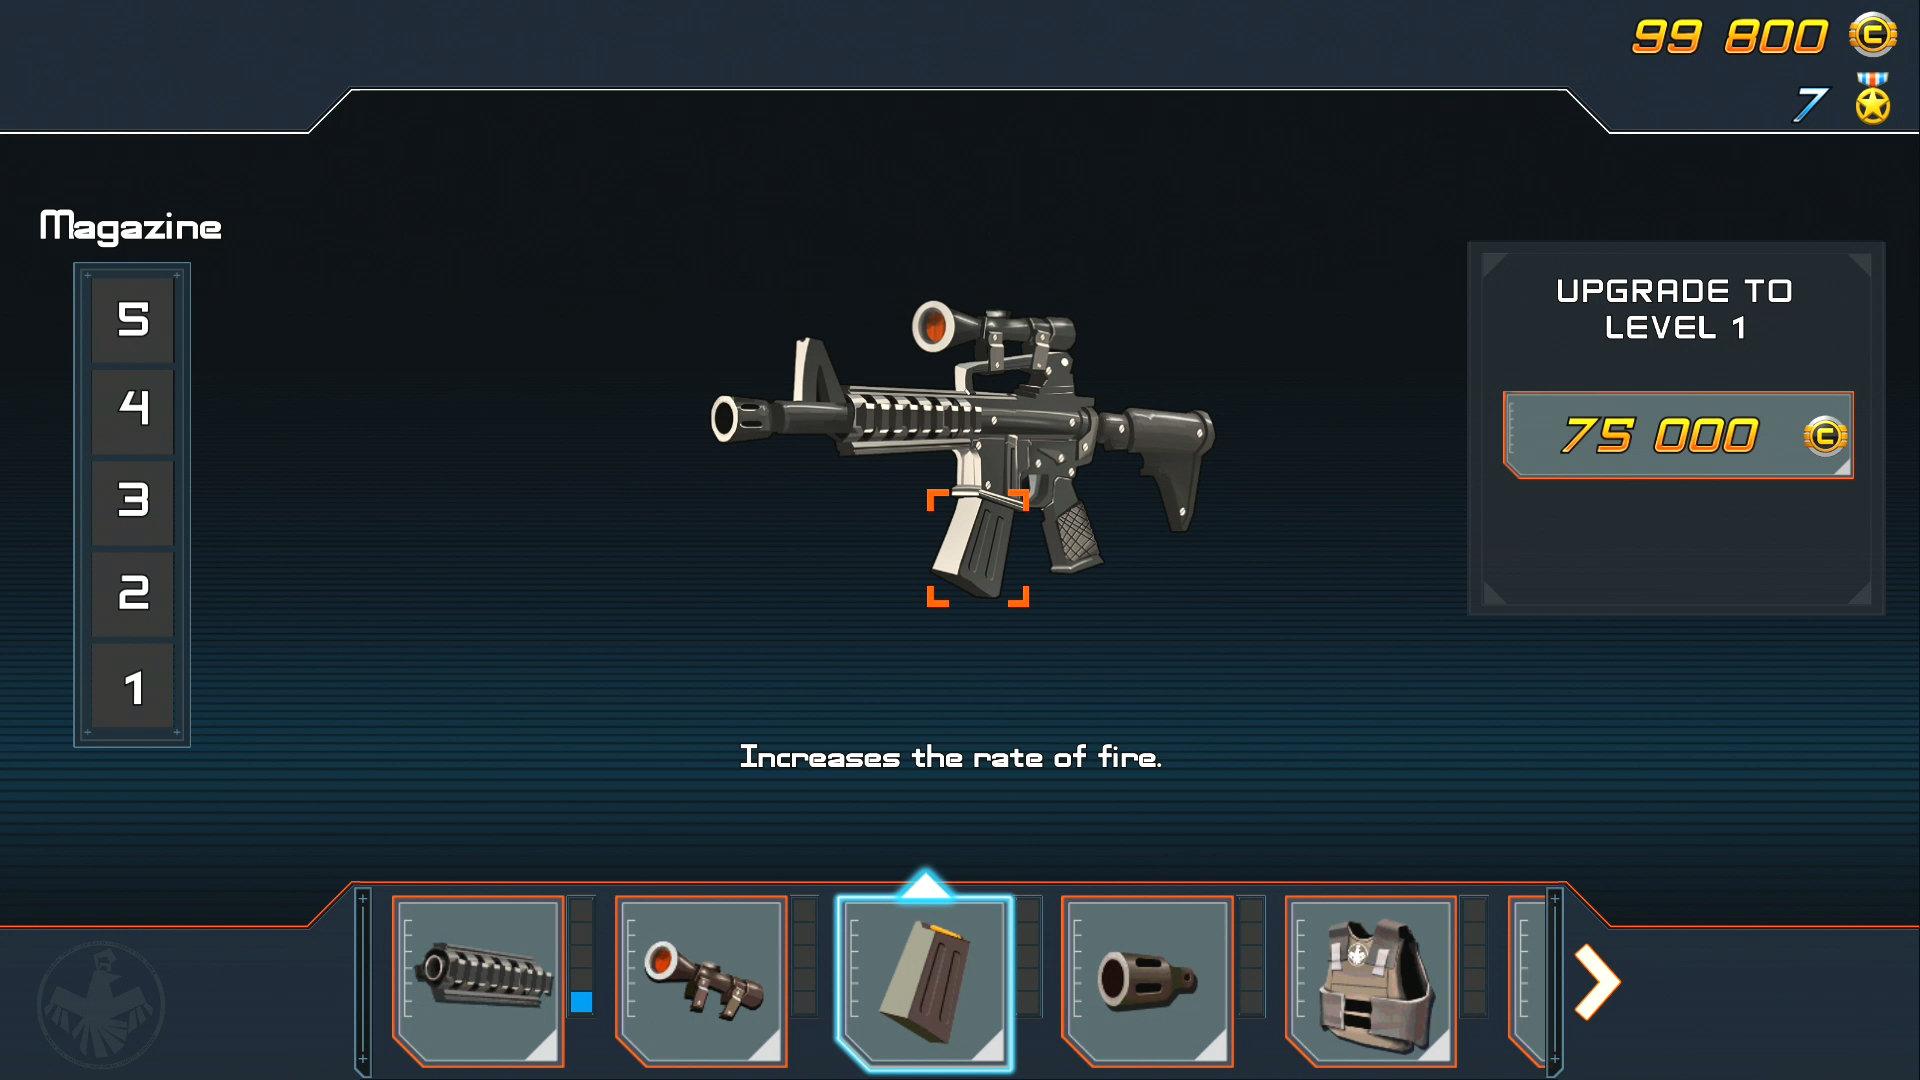 Joc Tiny Troopers Joint Ops + 5 Extra DLC Packs pentru PS4 1